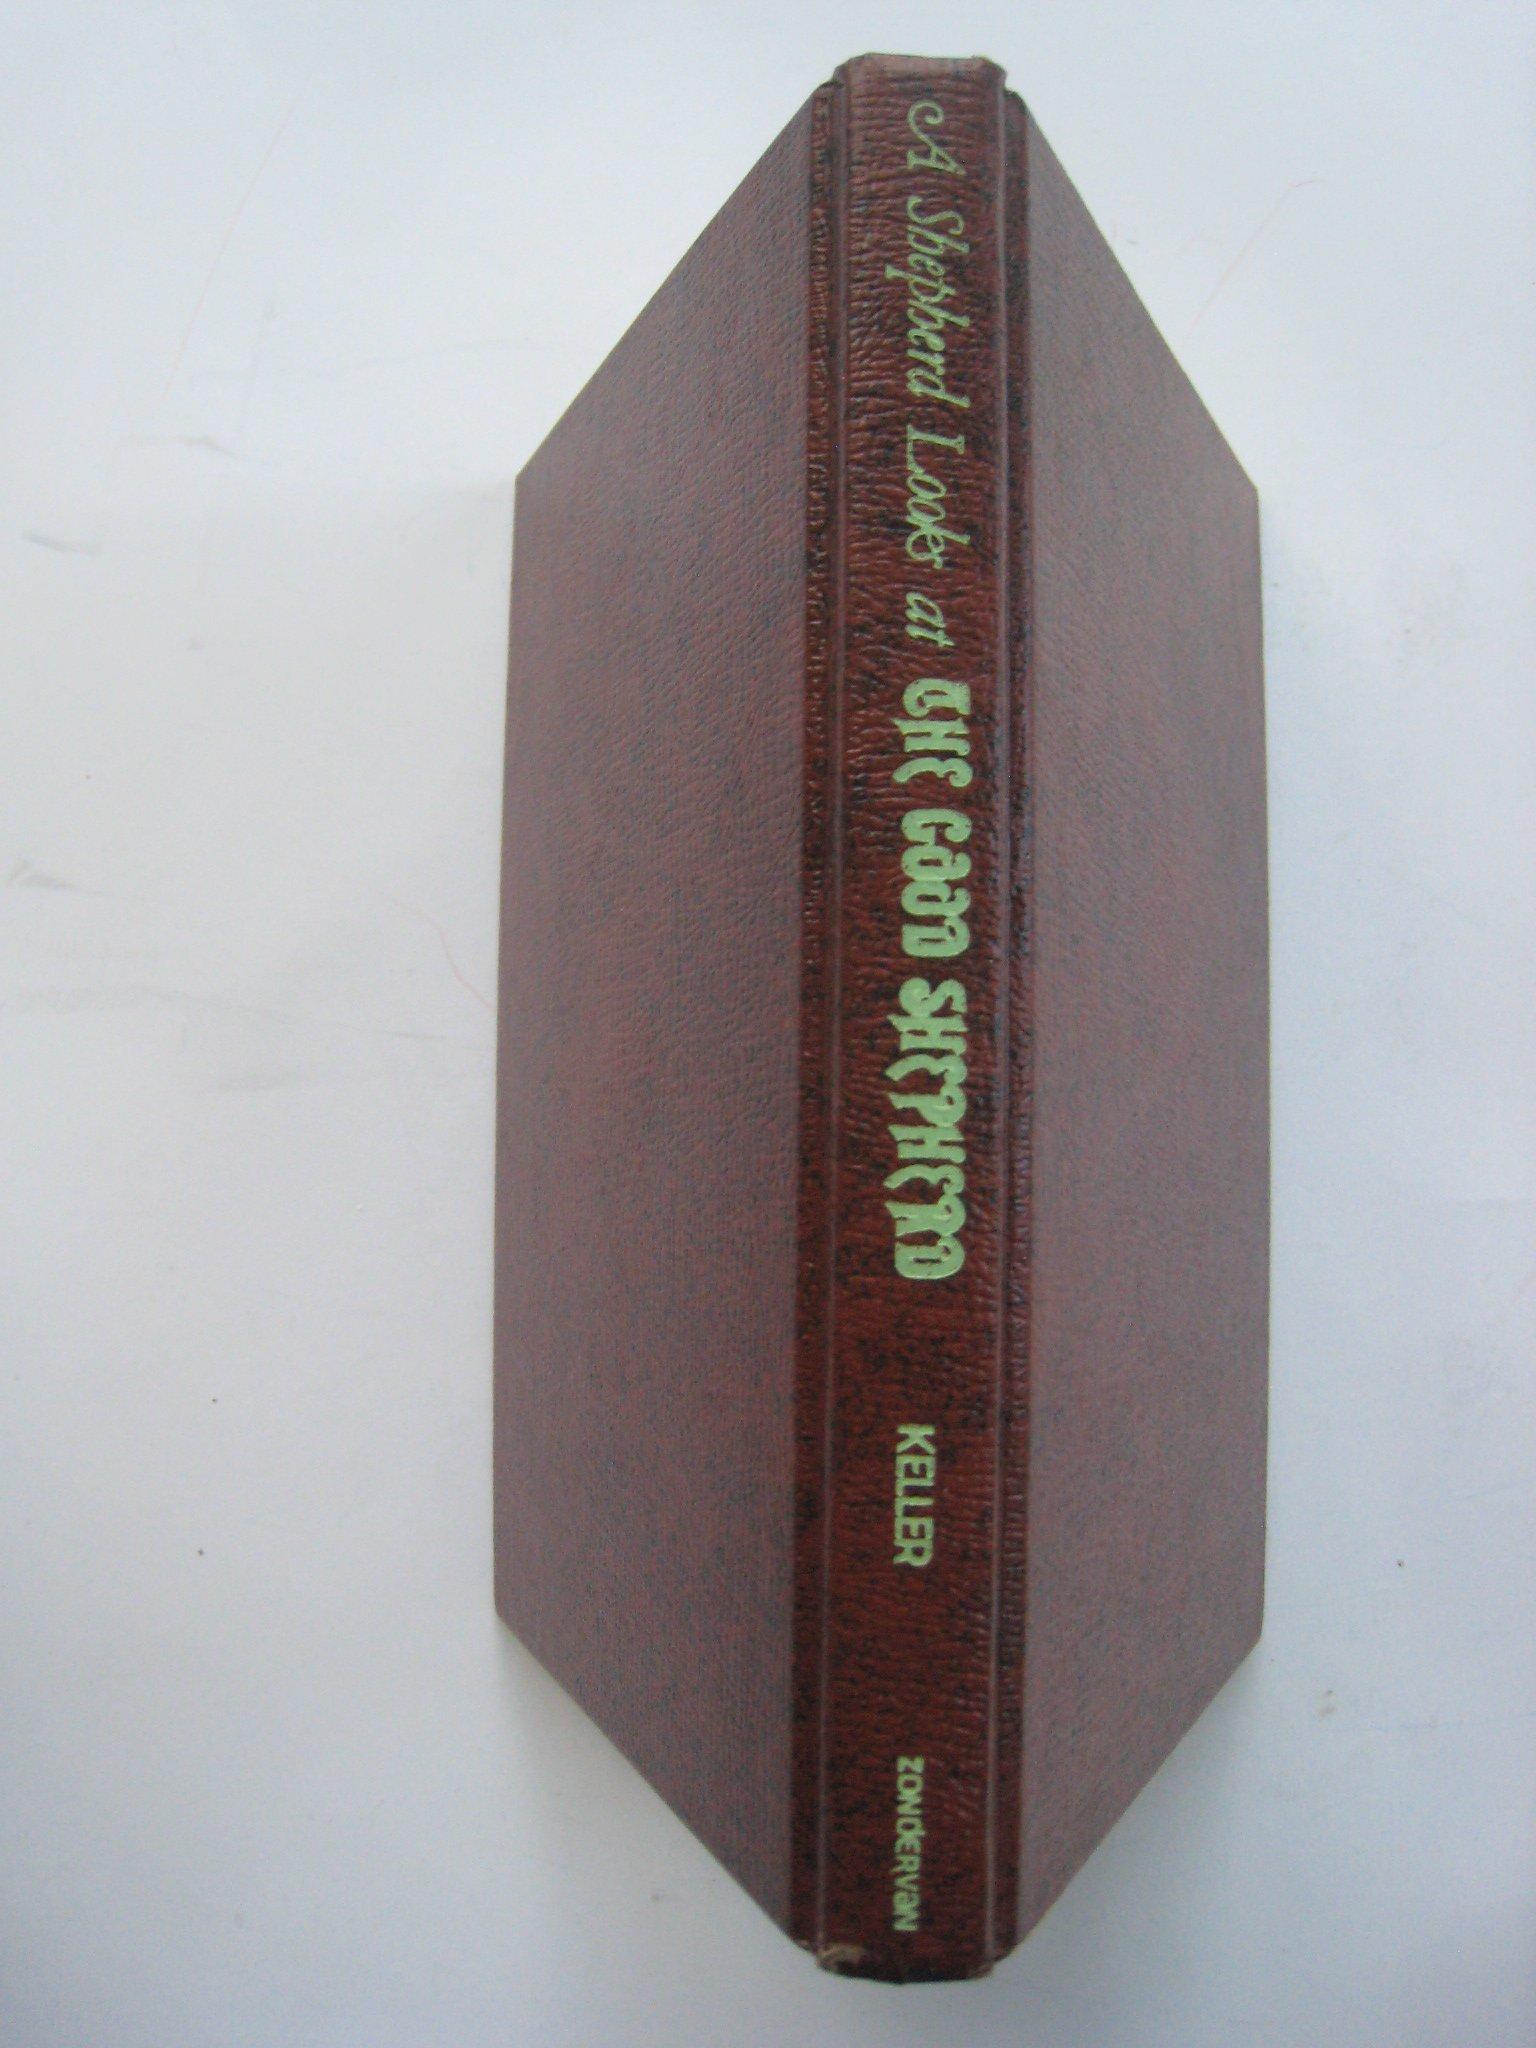 A Shepherd Looks at the Good Shepherd and His Sheep: Weldon Phillip Keller:  9780310268000: Amazon.com: Books